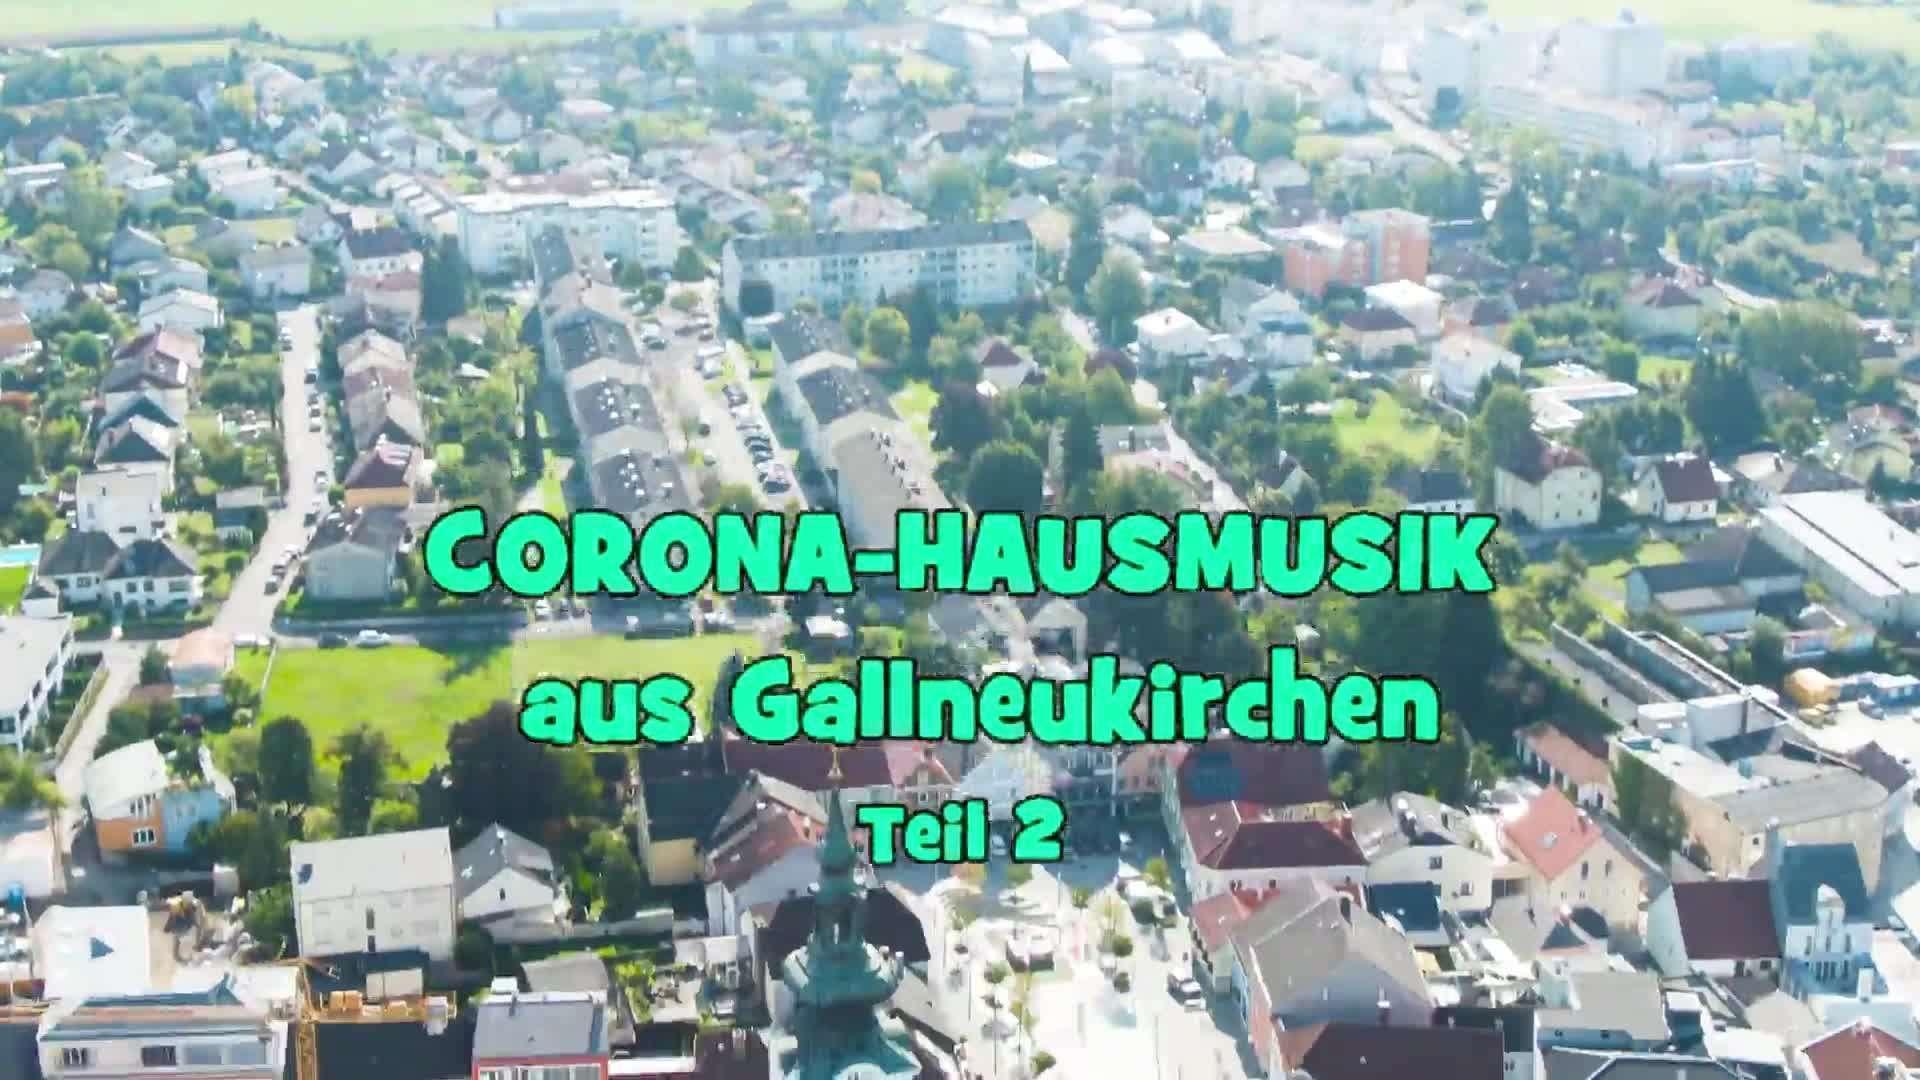 Corona - Hausmusik aus Gallneukirchen, Teil 2